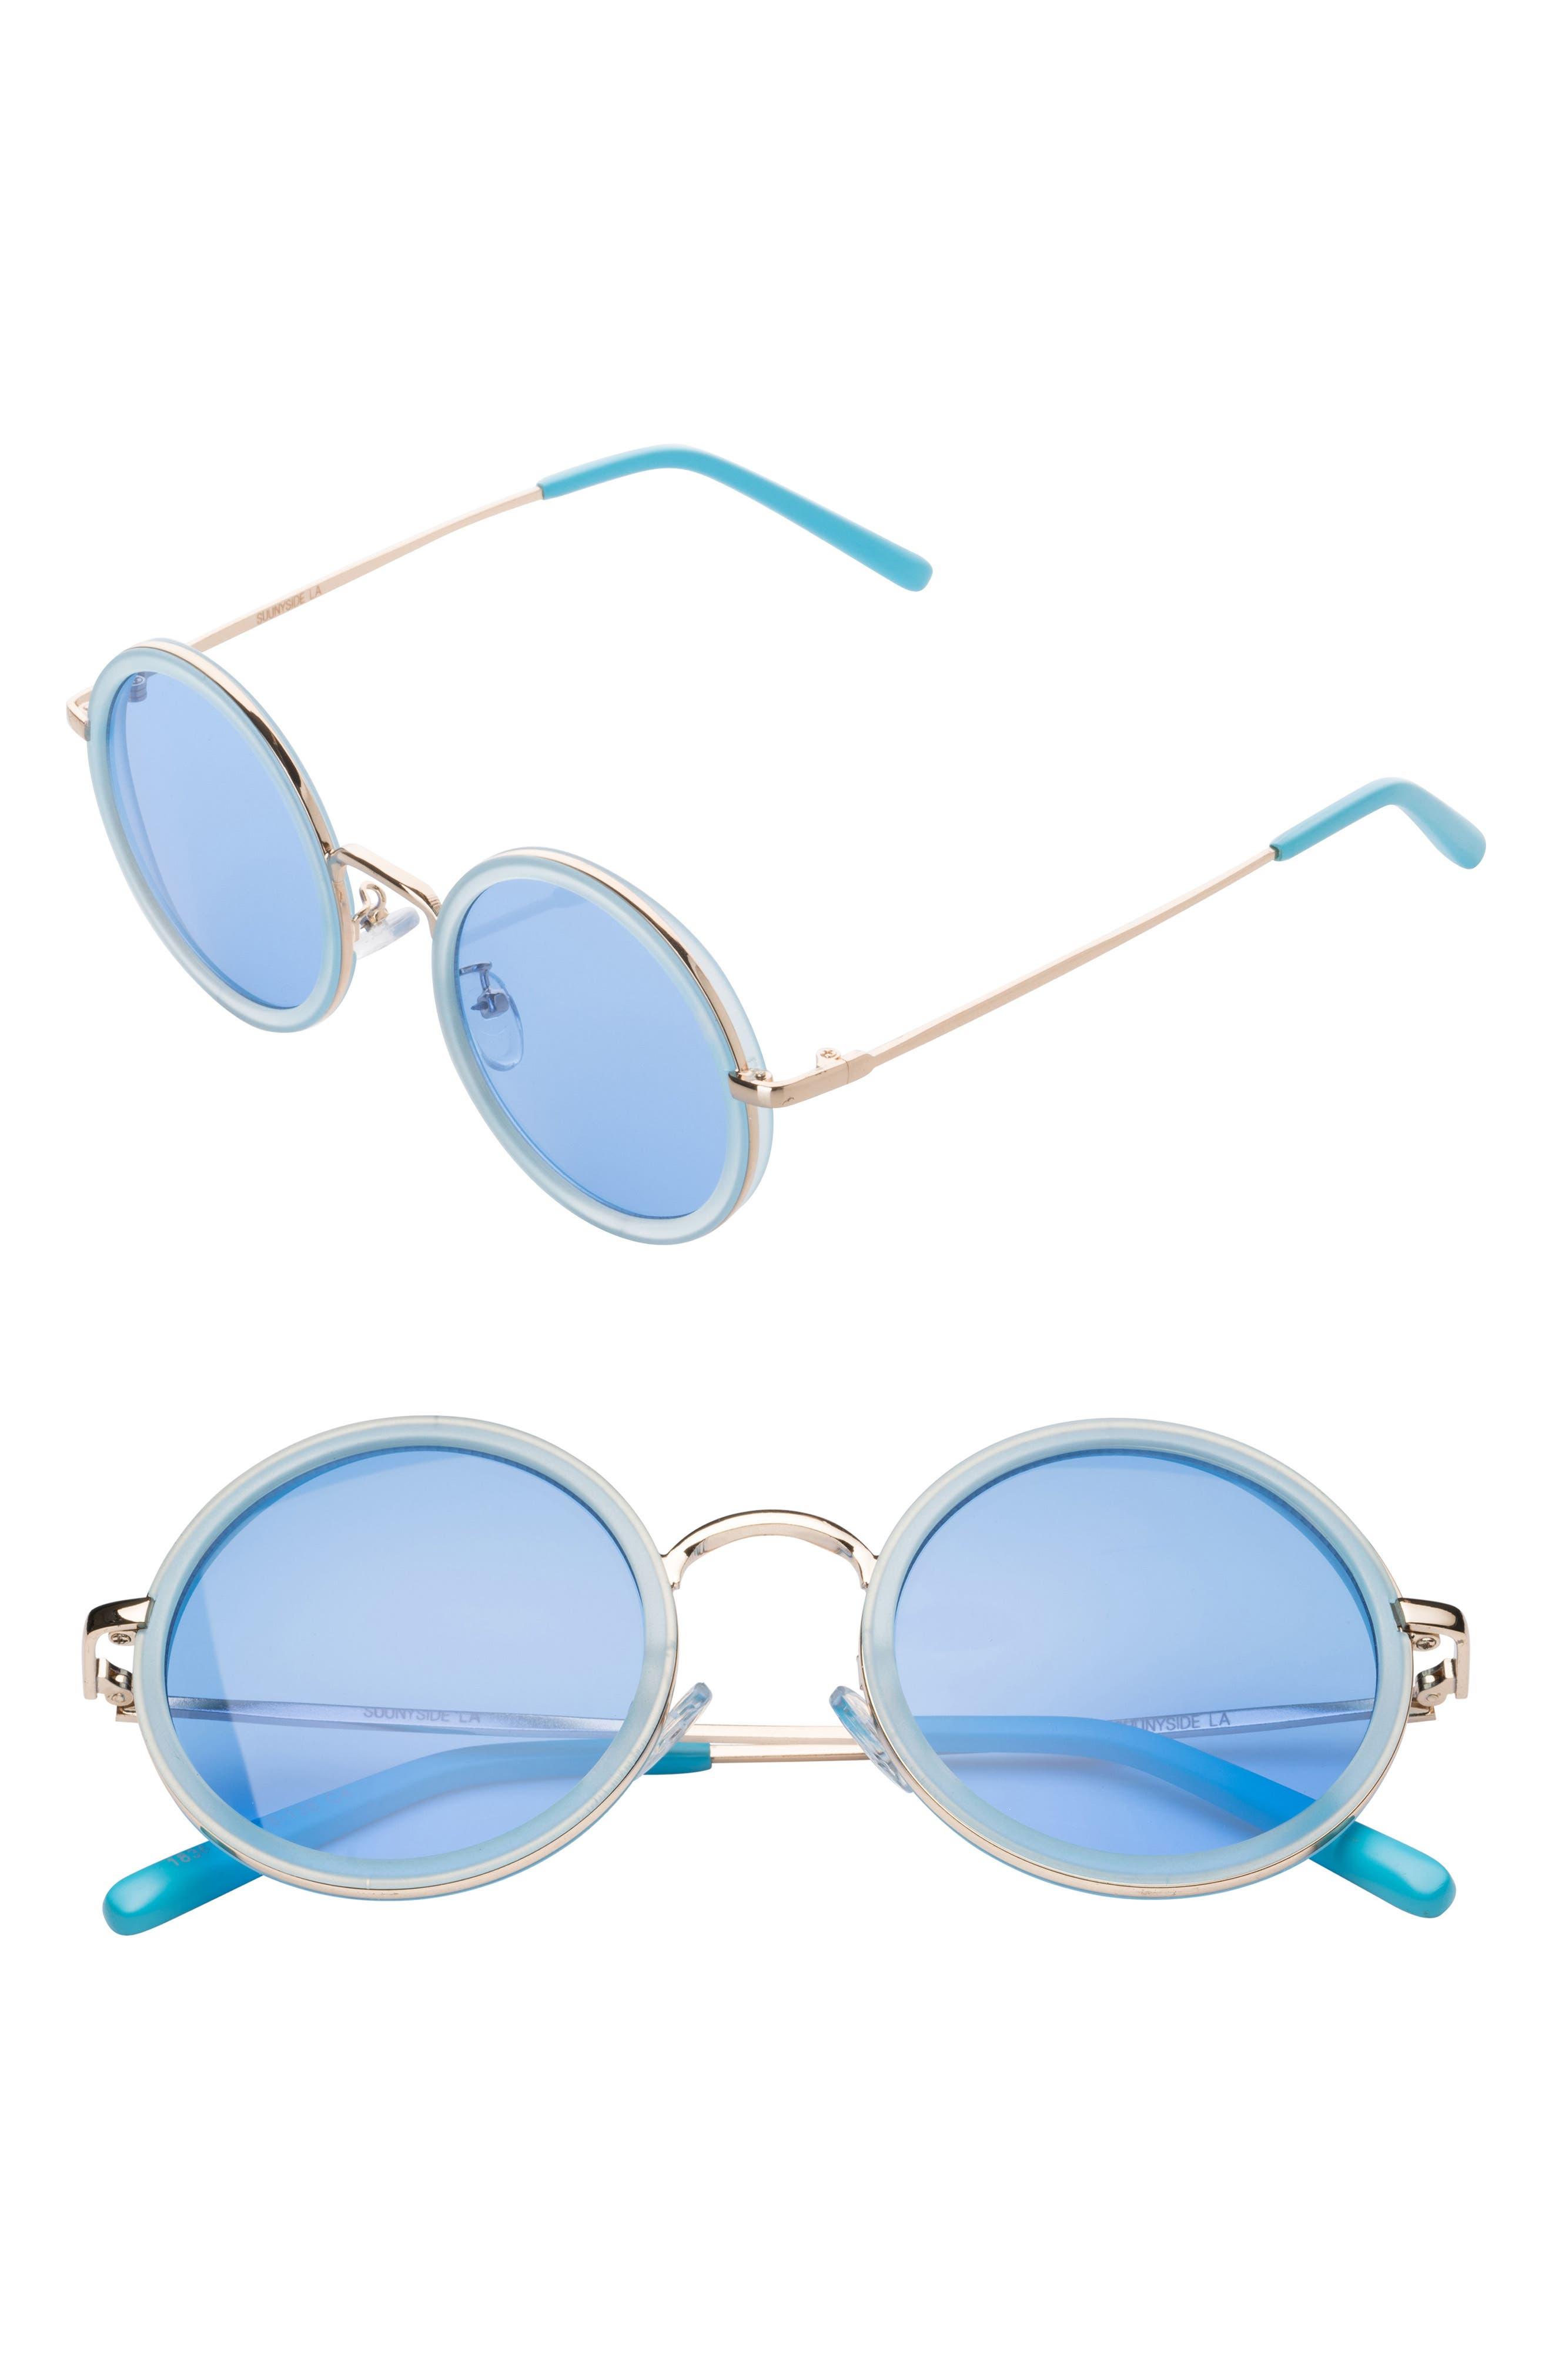 48mm Round Sunglasses,                         Main,                         color, 400